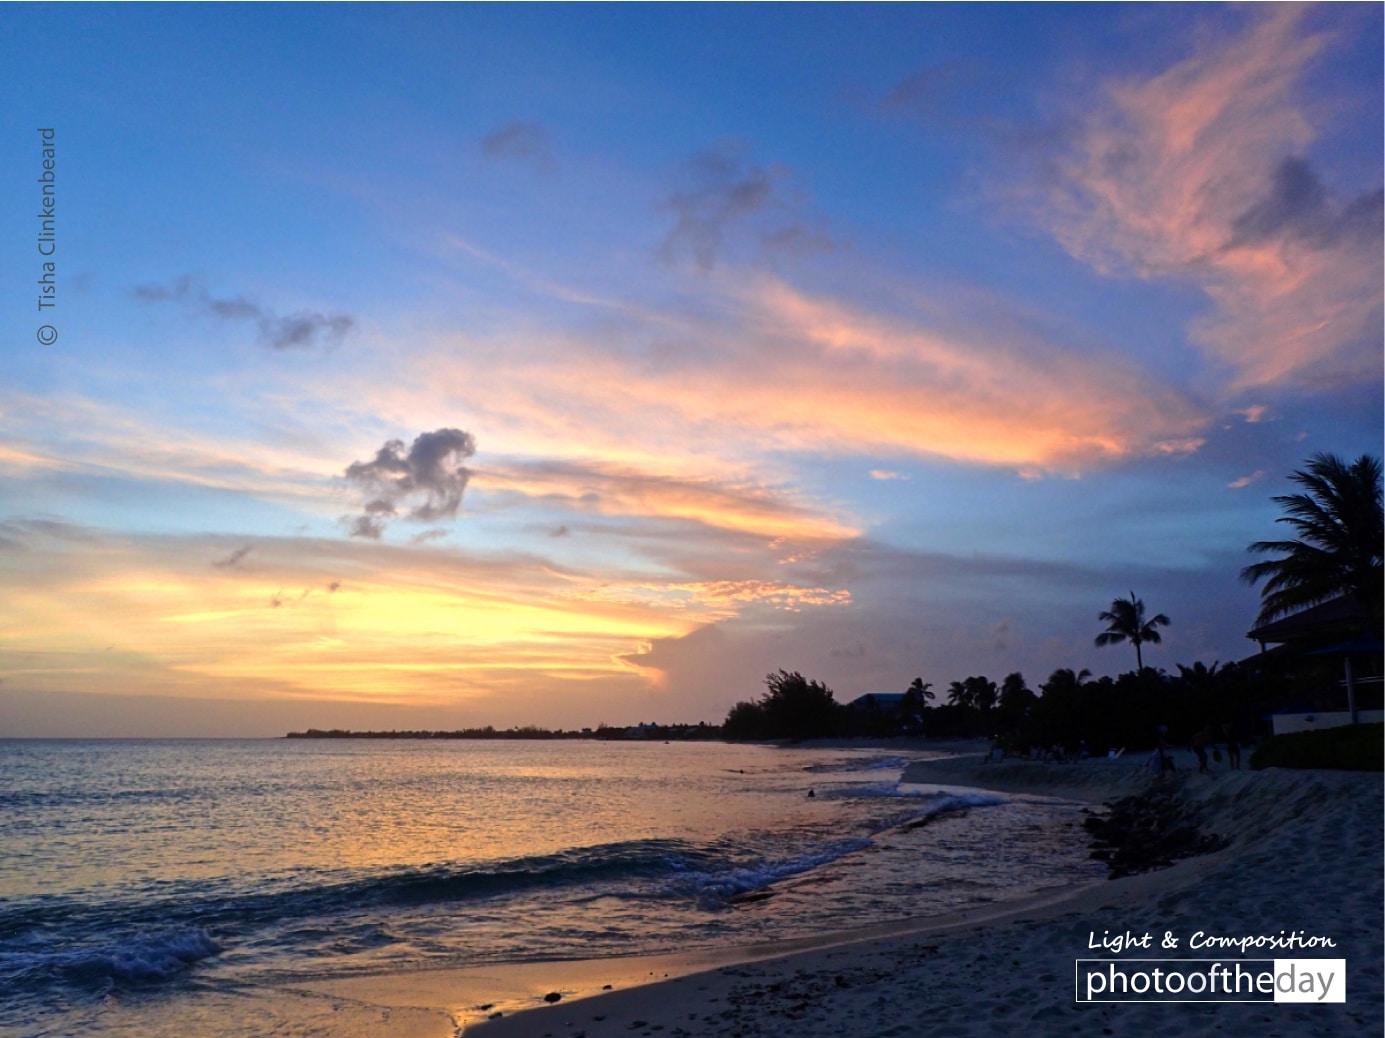 Cayman Sunset, by Tisha Clinkenbeard